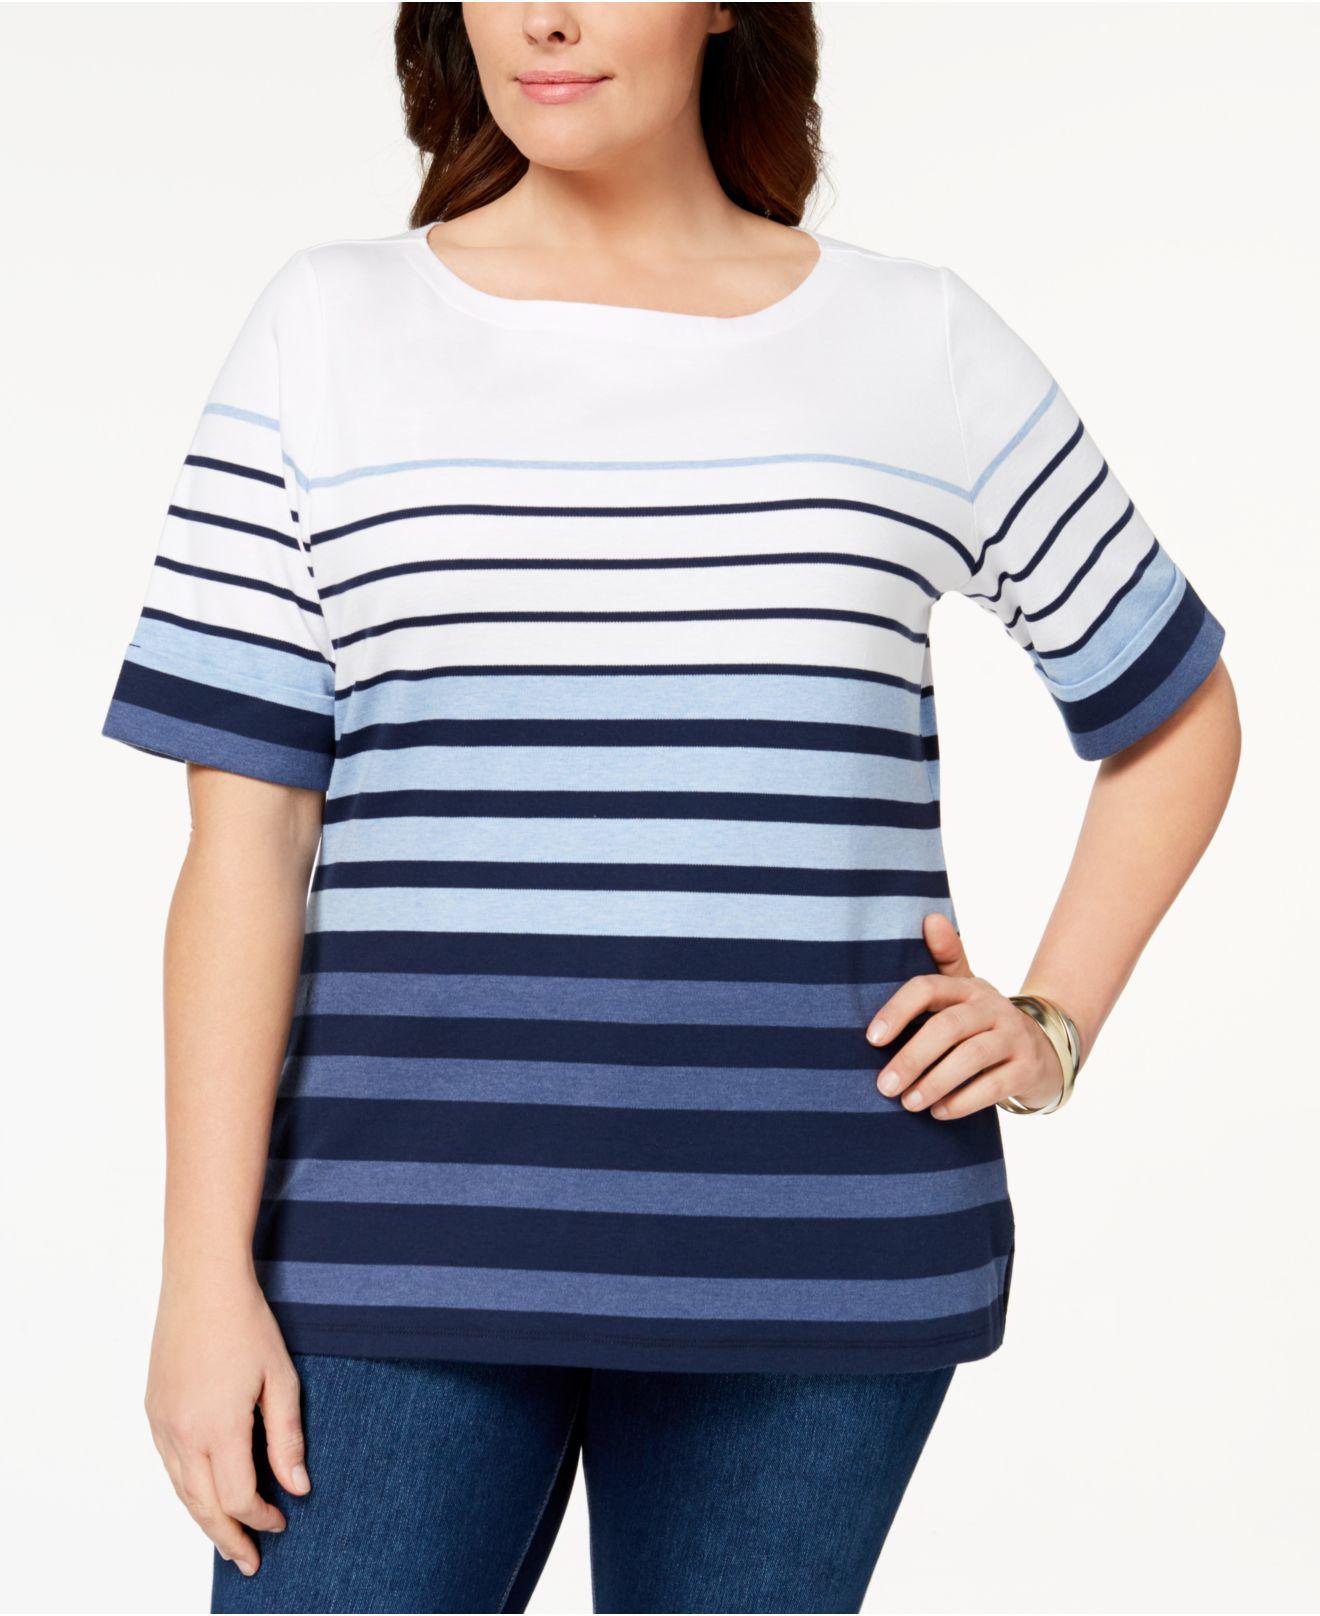 c8ff573f0d9 Lyst - Karen Scott Plus Size Cotton Striped Cuffed-sleeve Top ...